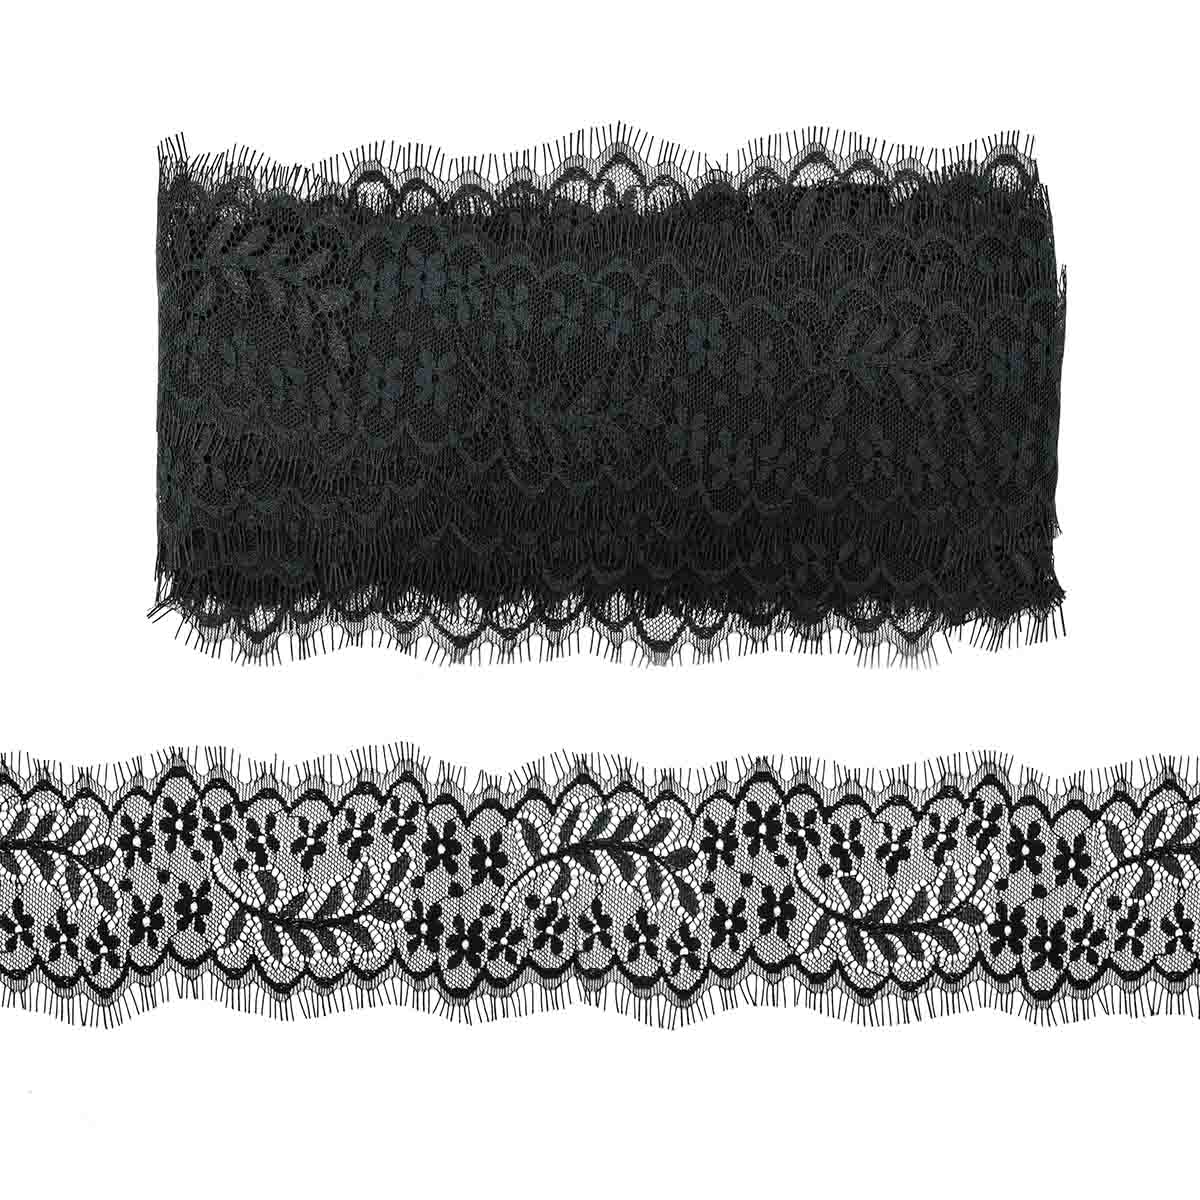 SJ061 Кружево 'Шантильи' на сетке 8,0см*13,71м